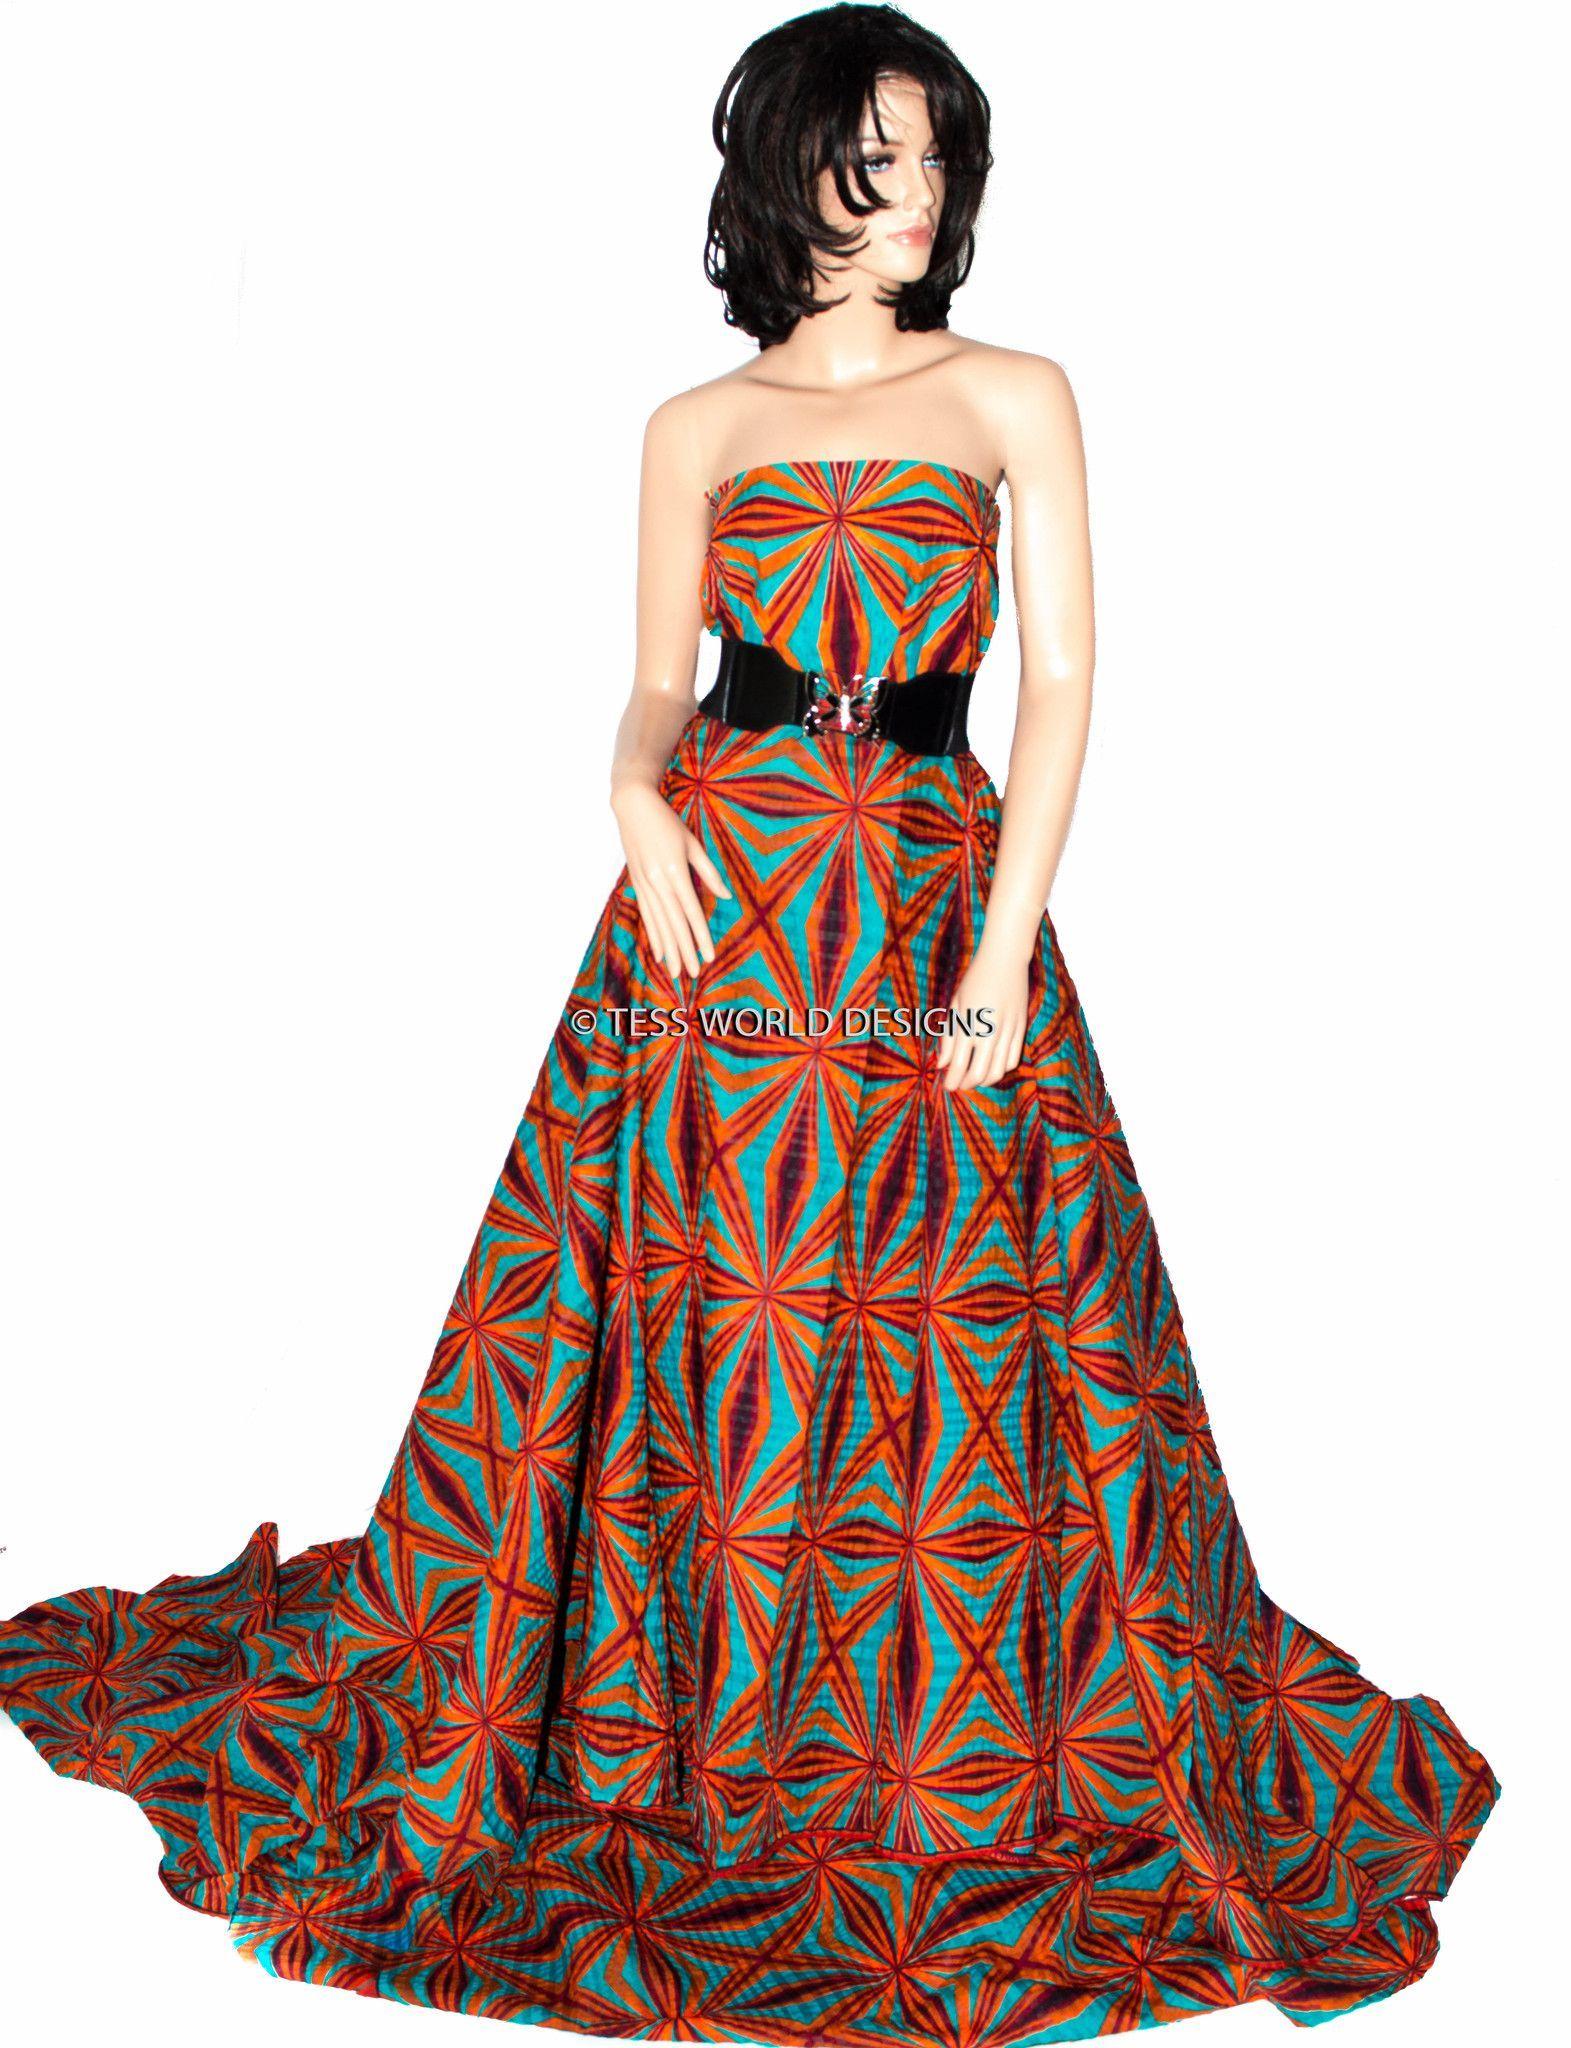 Wp620 Zambian African Print Fabric Abstract Seersucker Tess World Designs